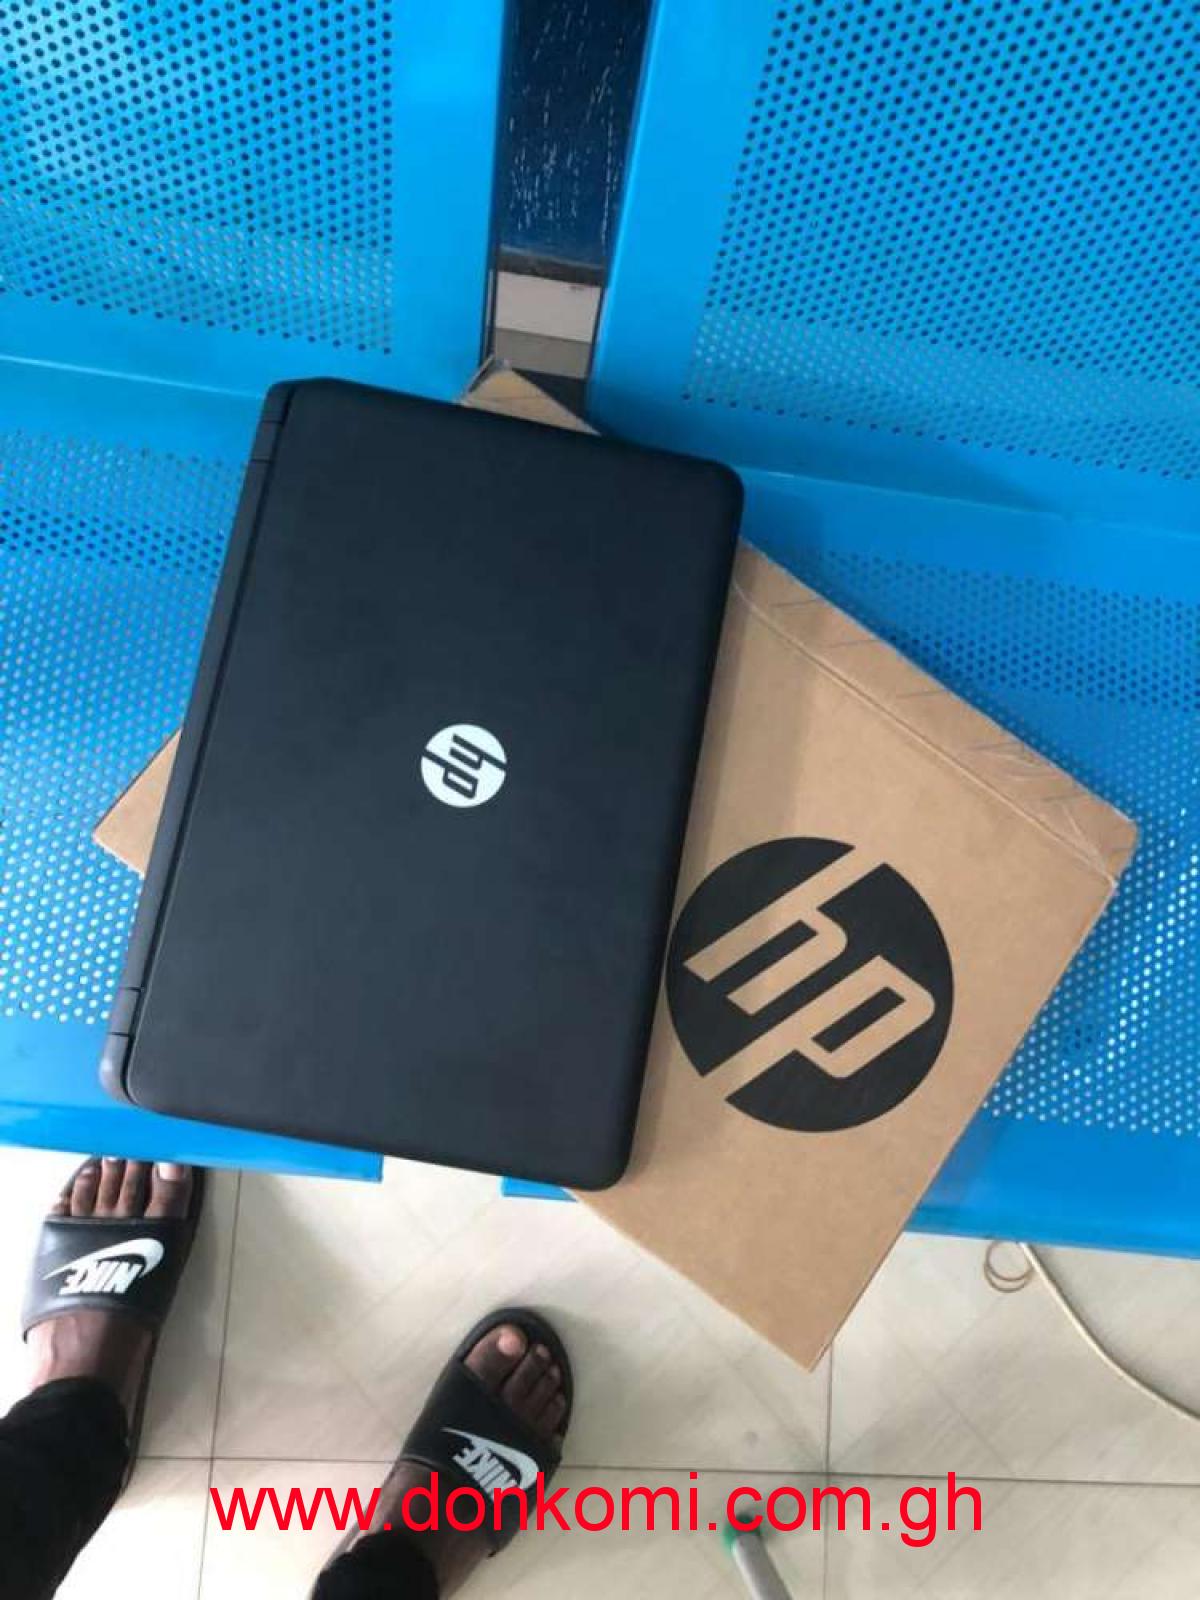 Brand New HP Pavilion 15 core 2 Duo